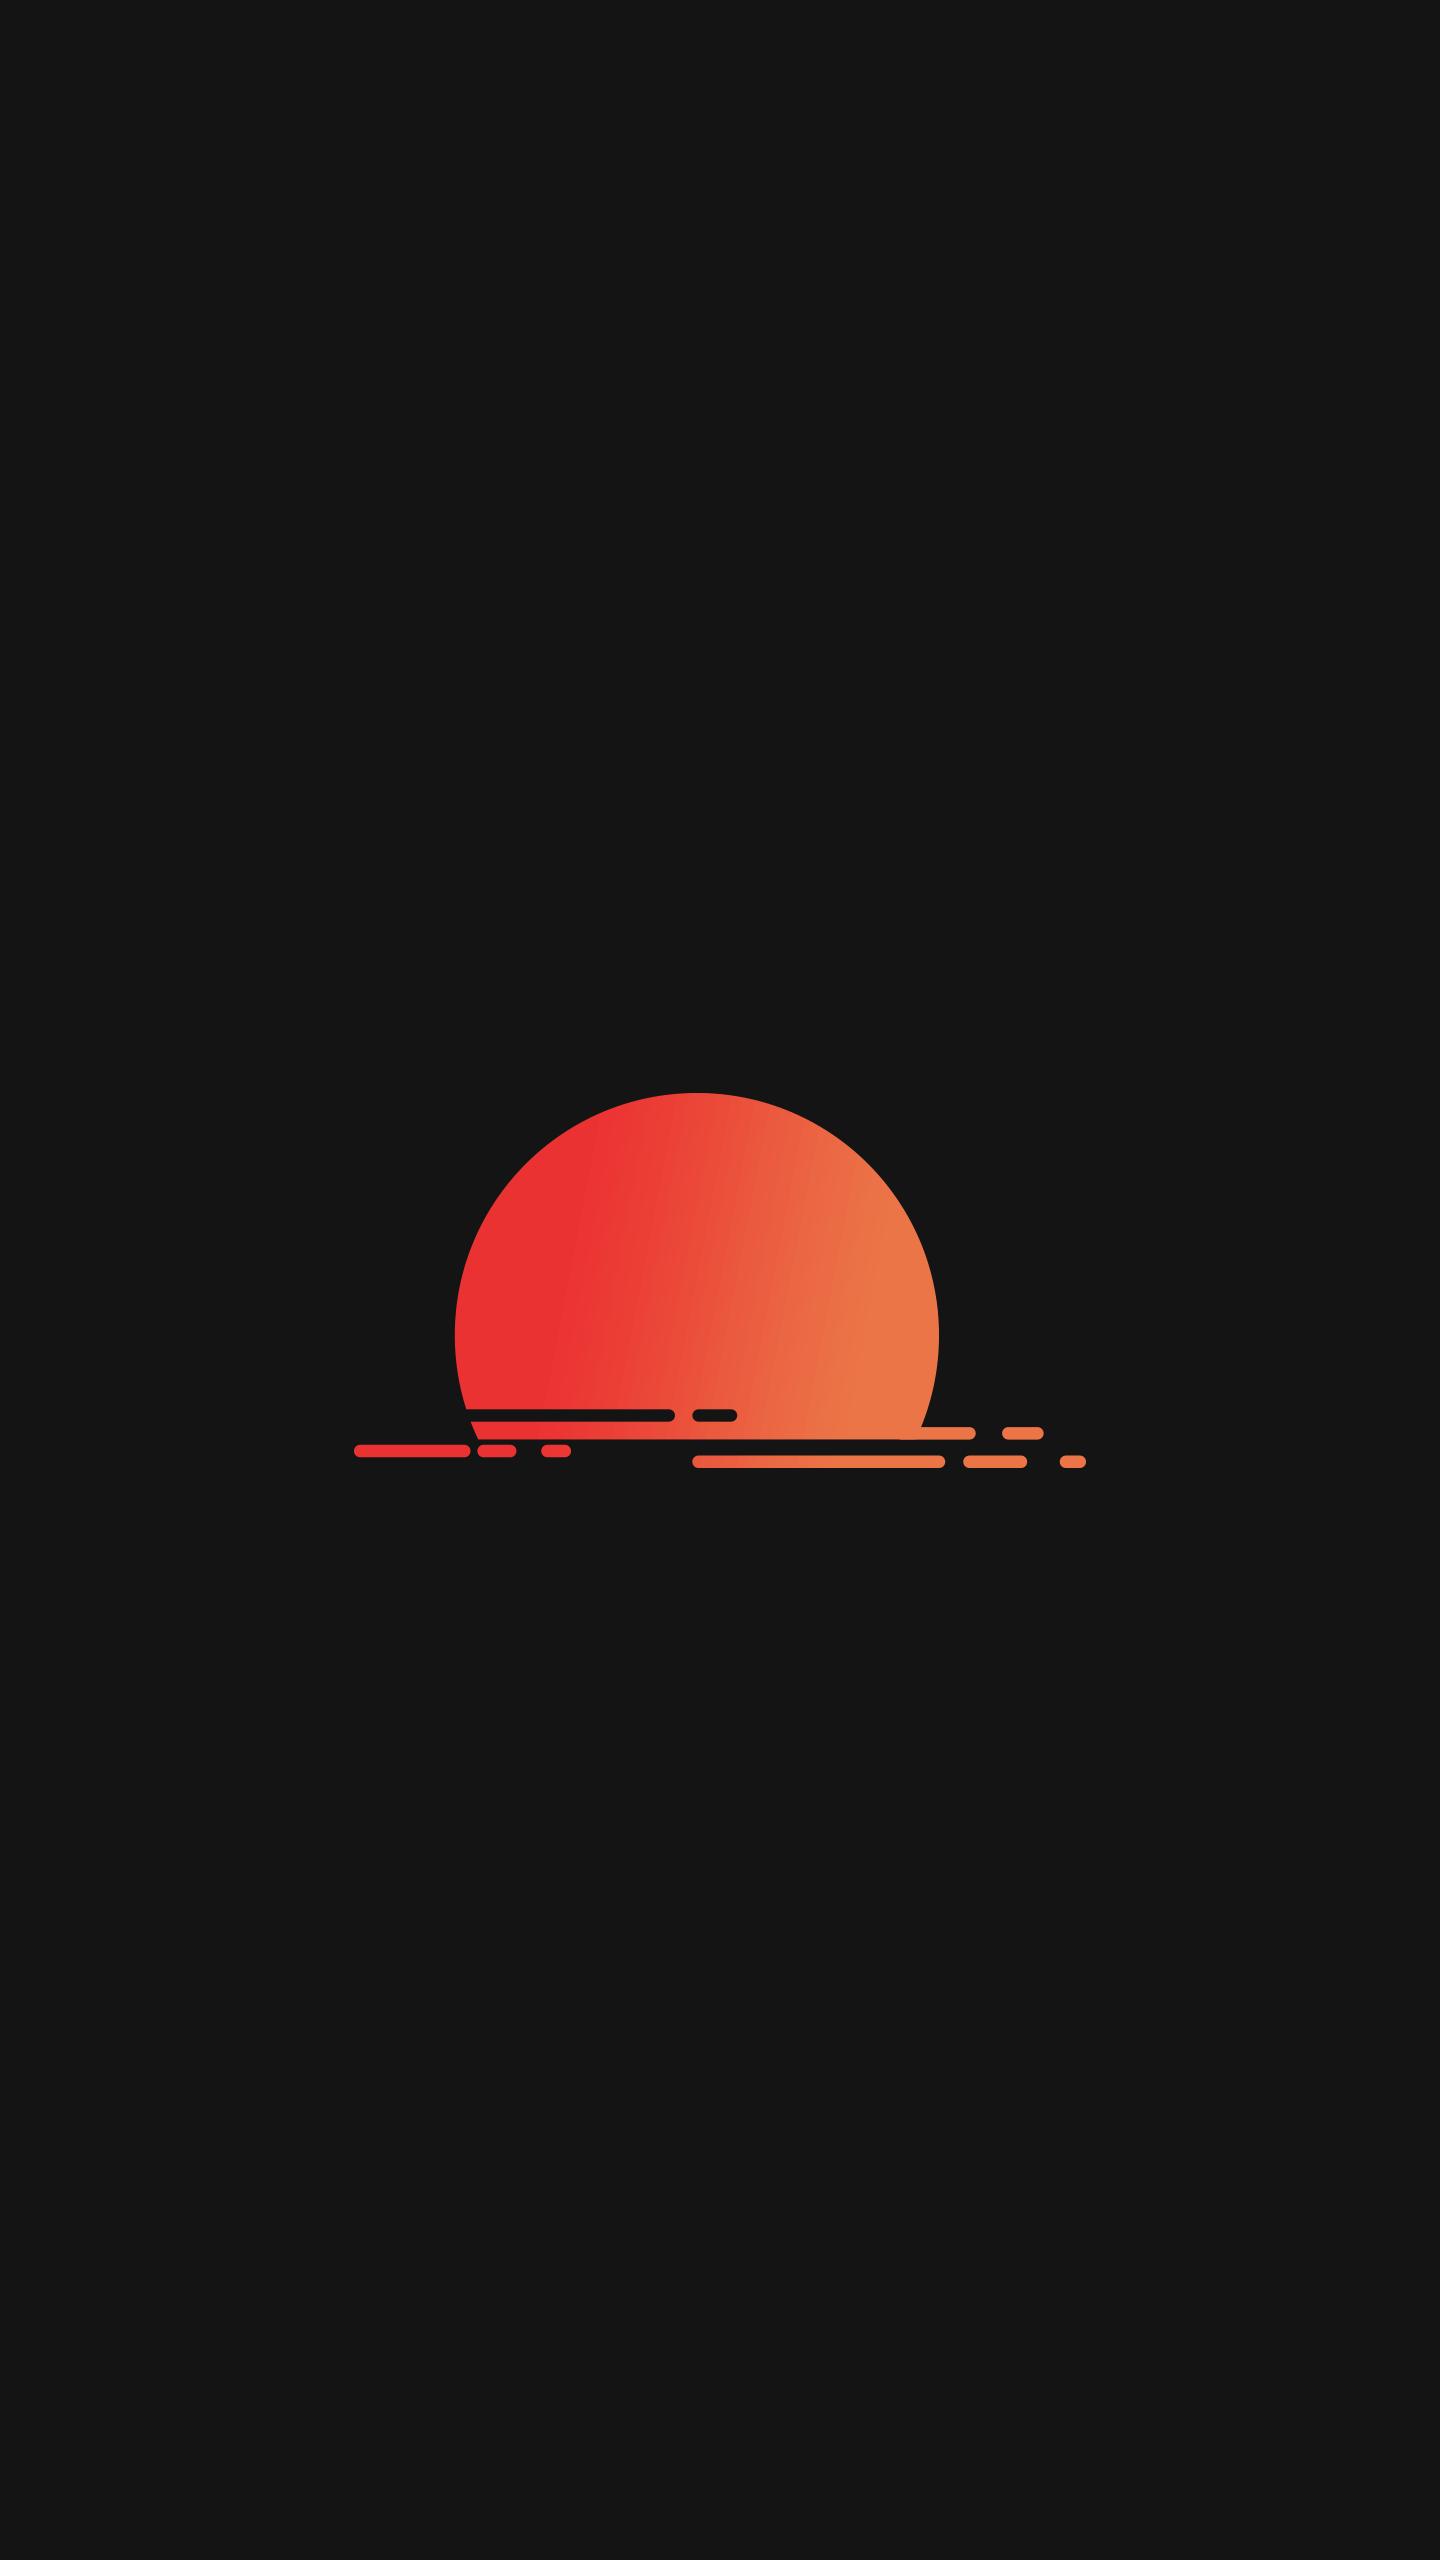 Amoled Sun iPhone Wallpaper